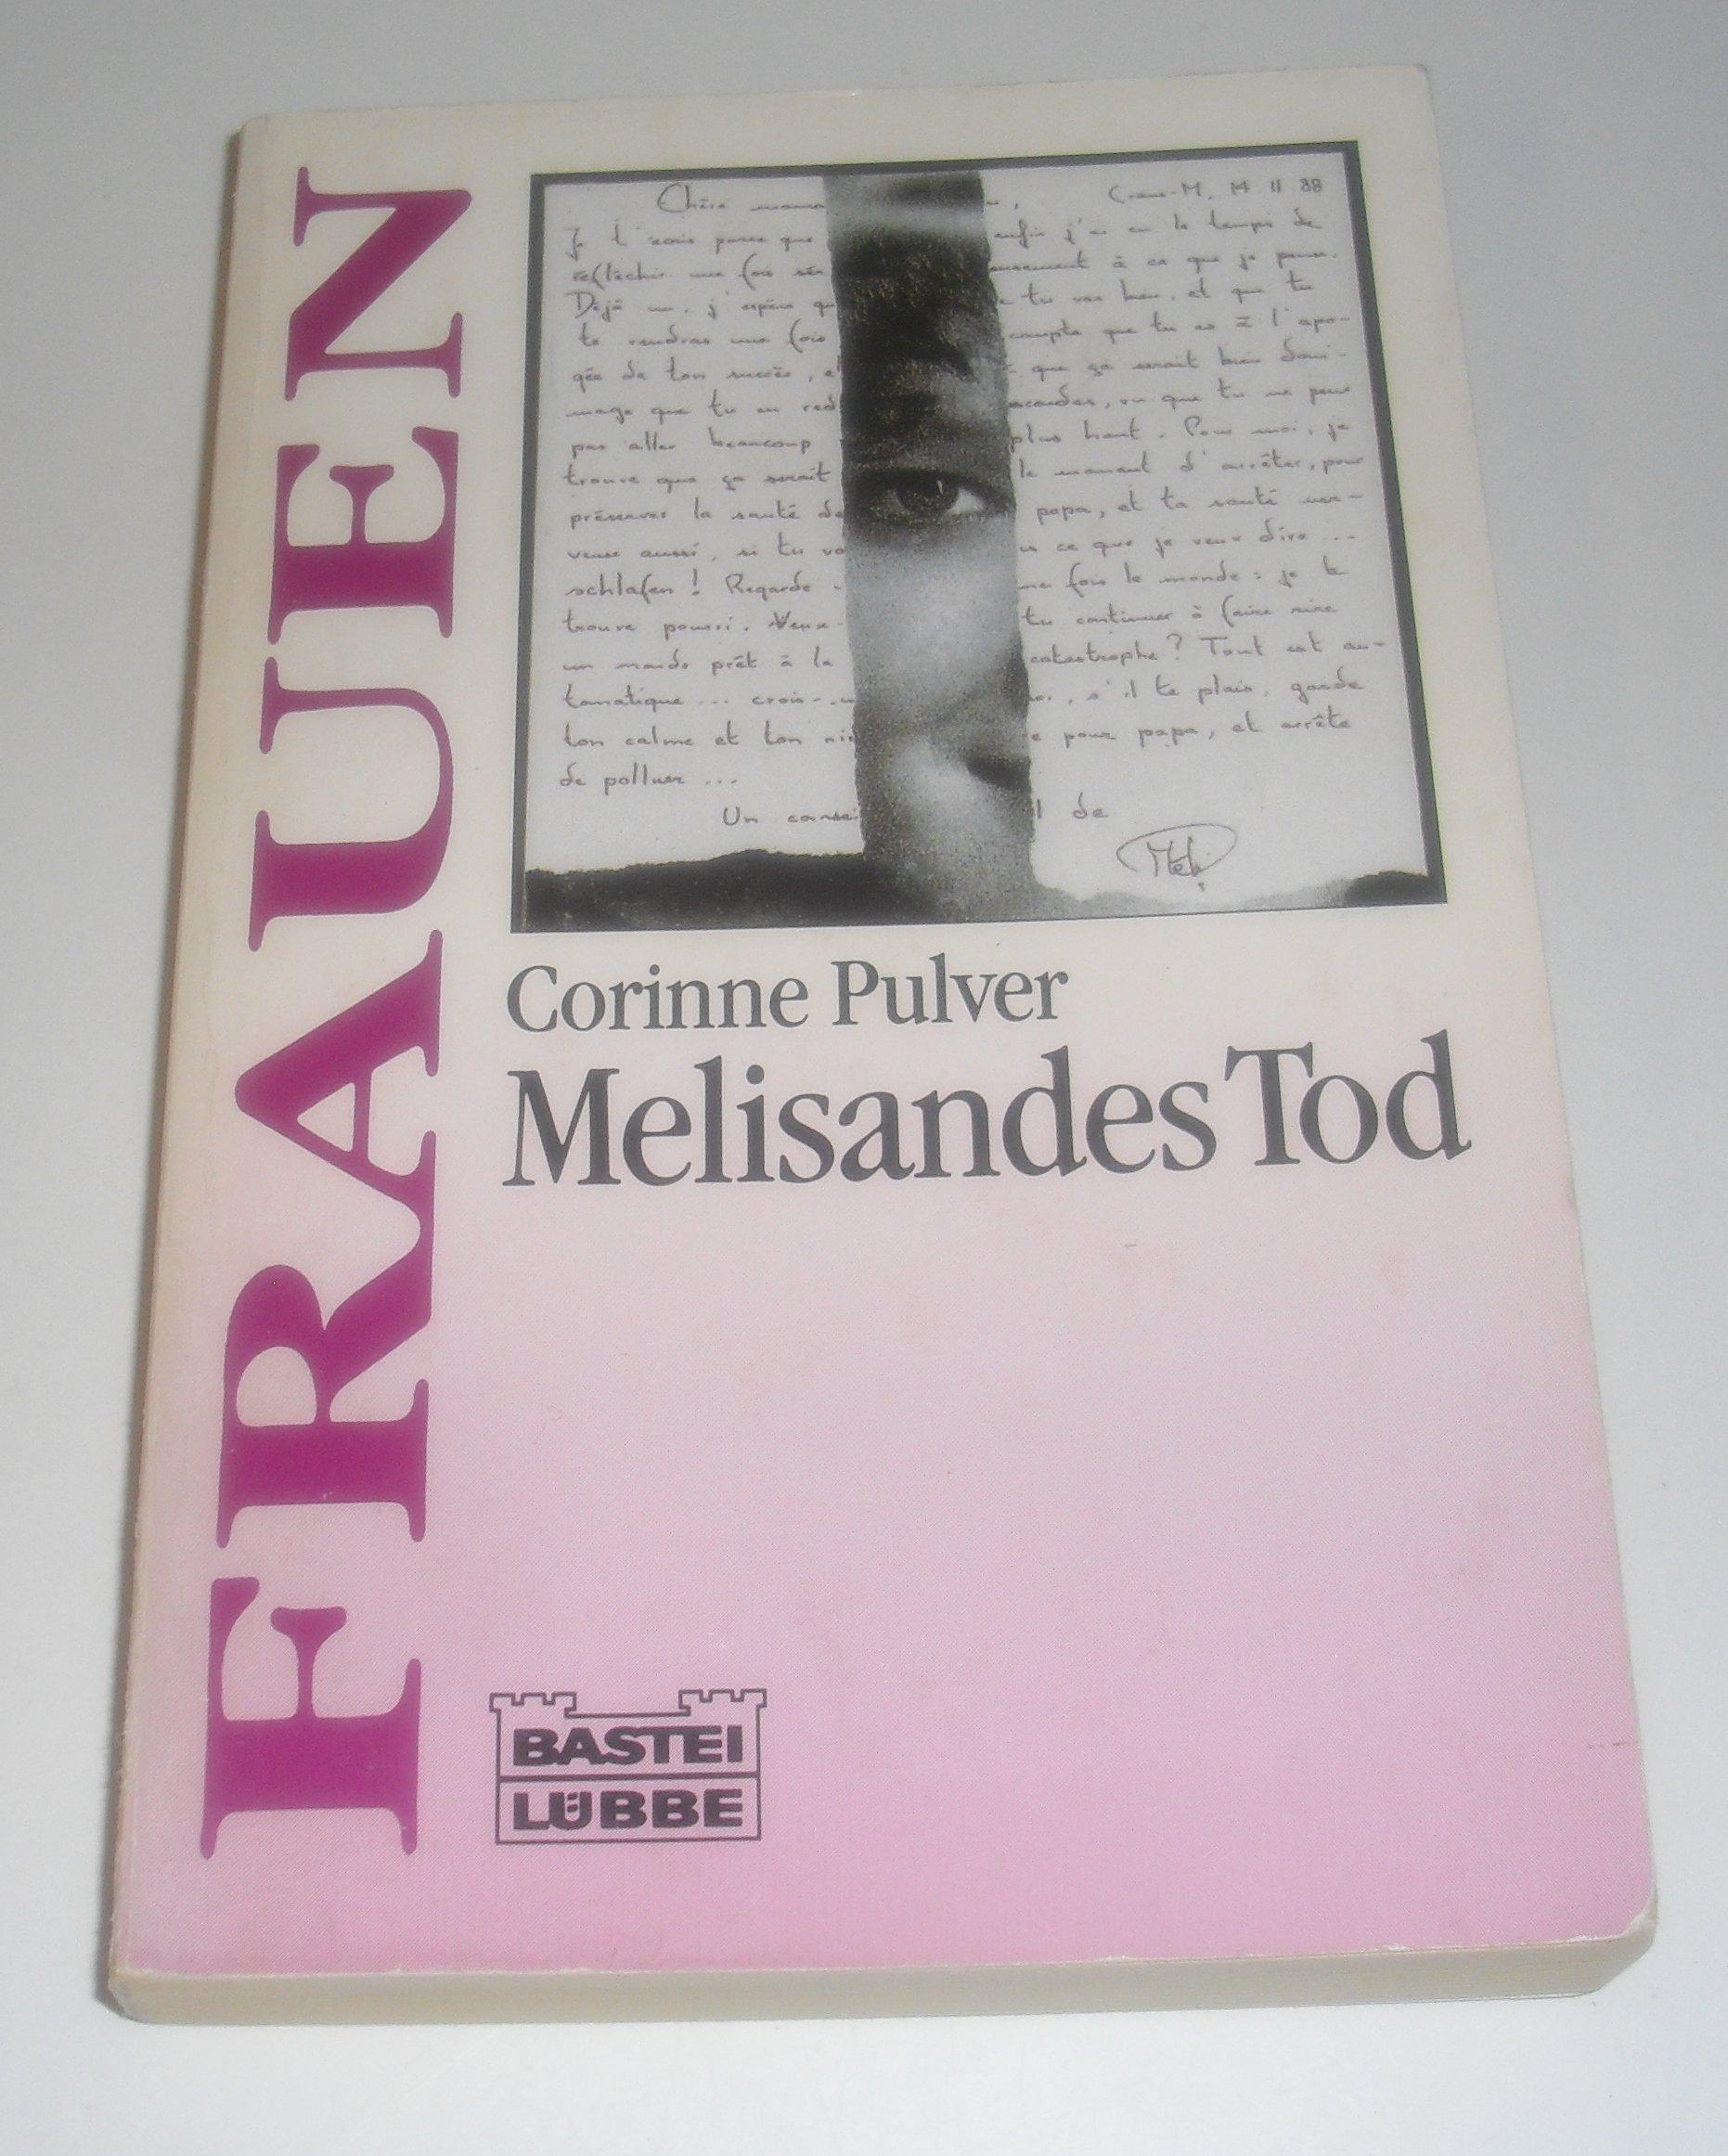 Melisandes Tod